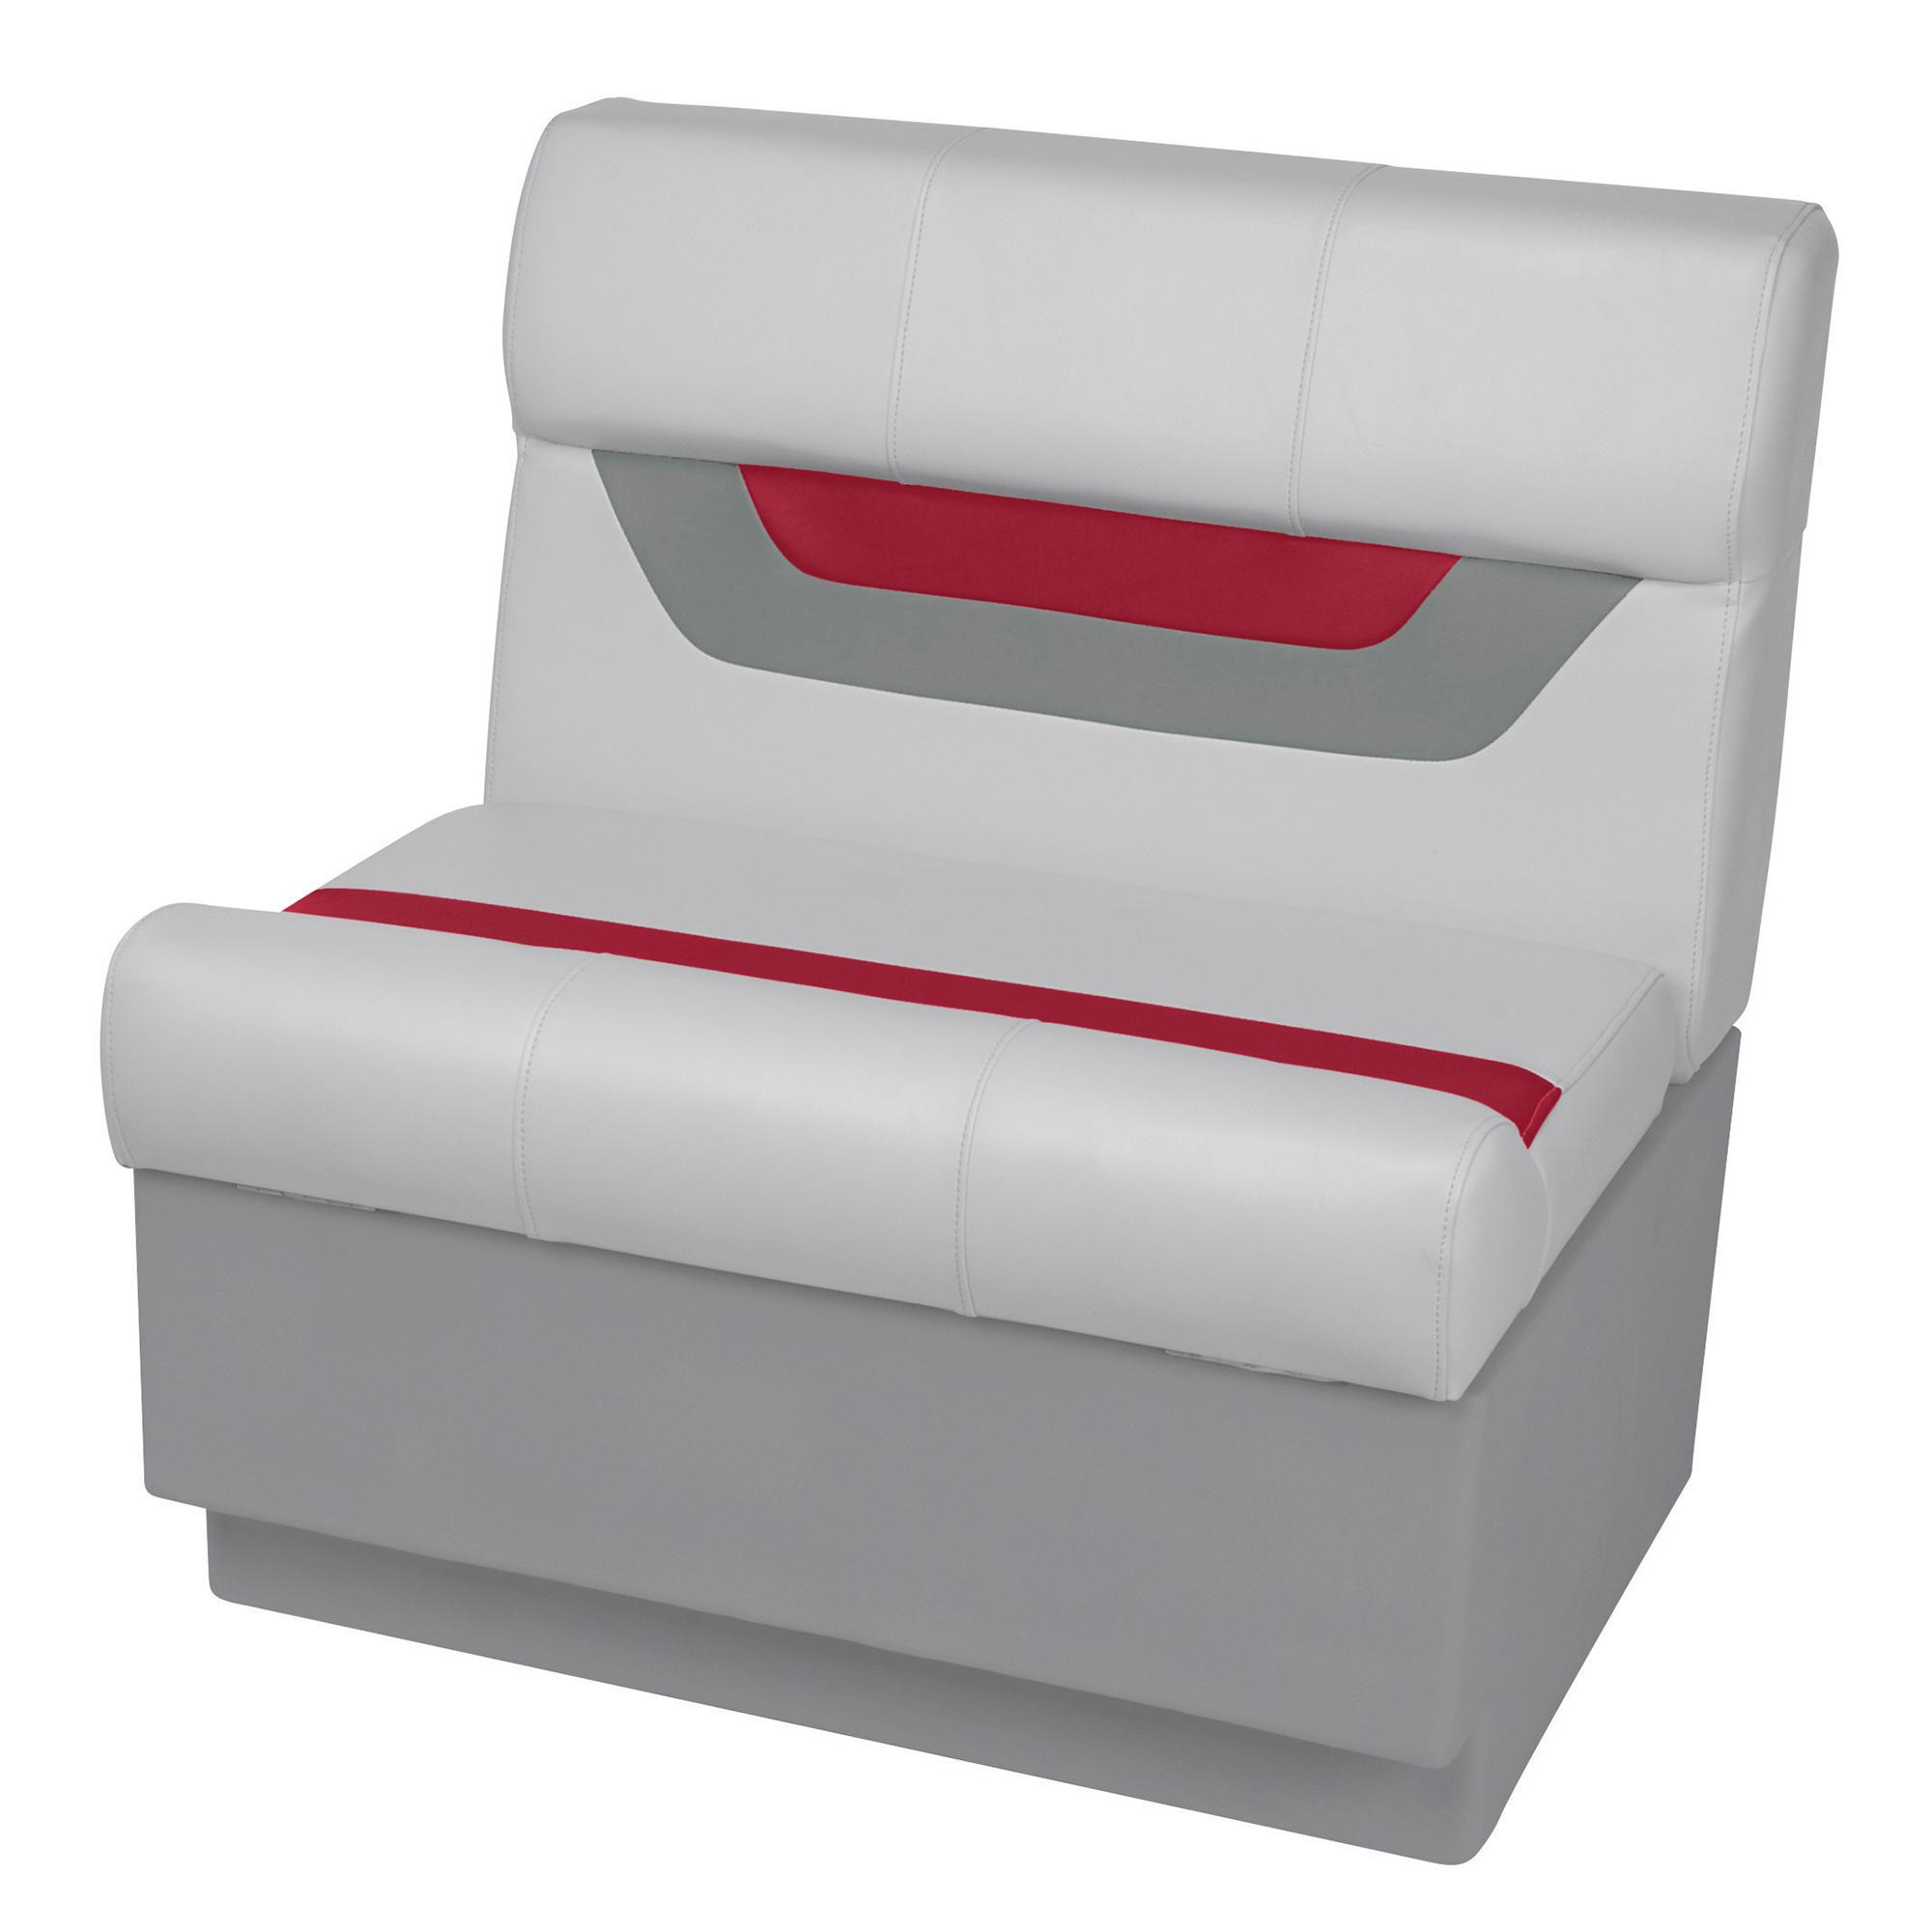 "Toonmate Designer Pontoon 27"" Wide Bench Seat - TOP ONLY - Sky Gray/Dark Red"